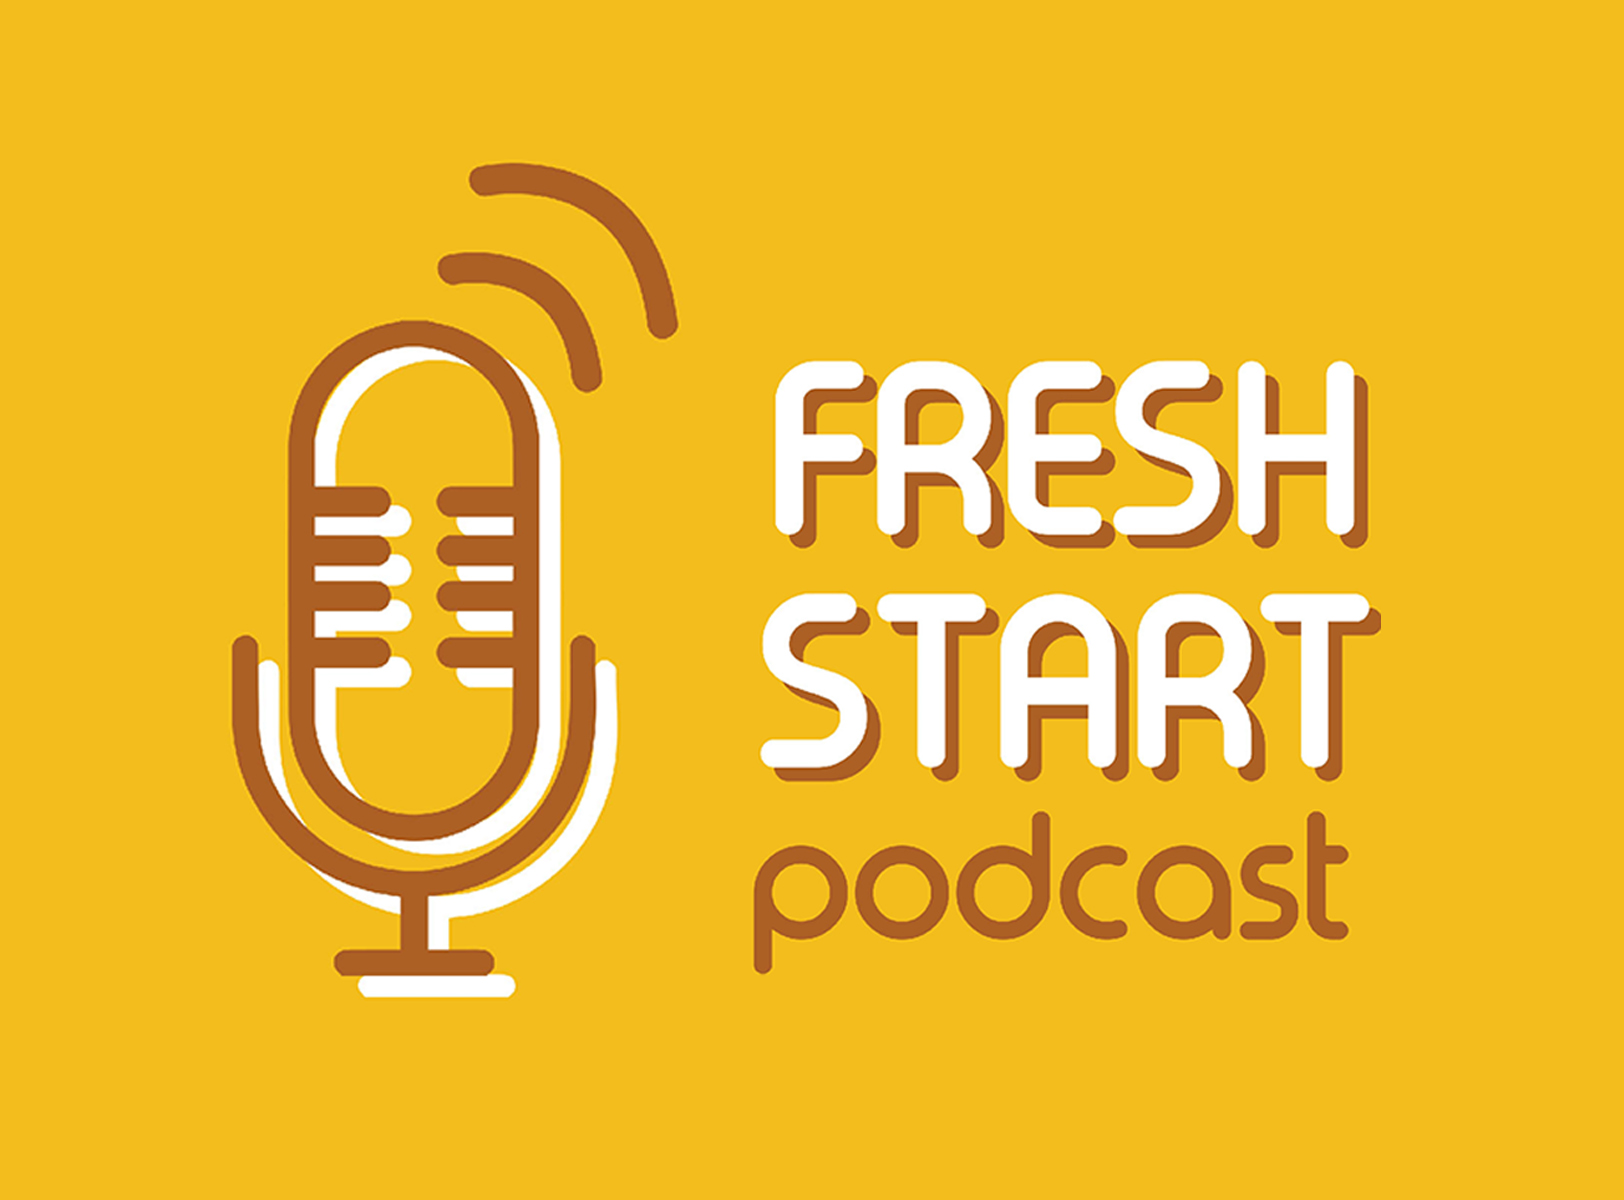 Fresh Start: Podcast News (4/24/2020 Fri.)